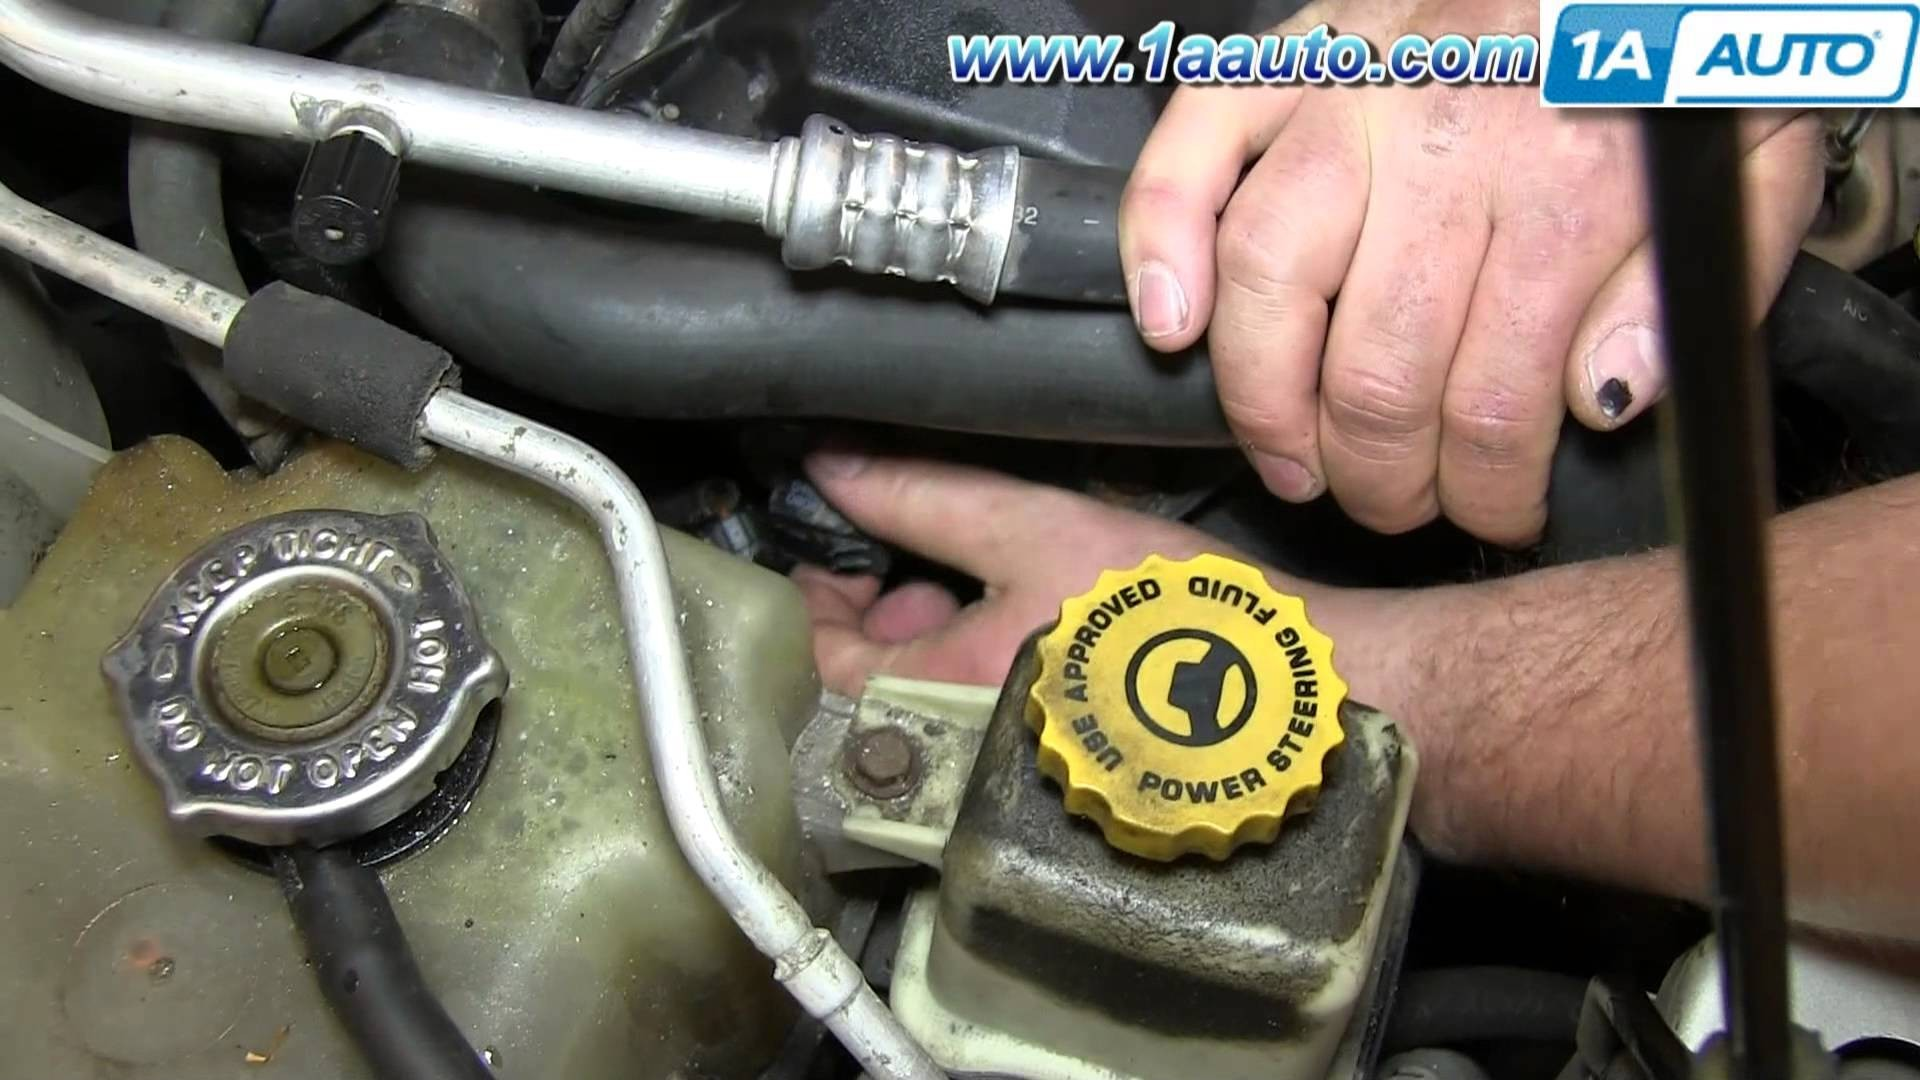 Dodge Caravan Engine Diagram 3 1 Liter V6 2004 Mazda Schematics 2010 How To Install Replace Camshaft Of